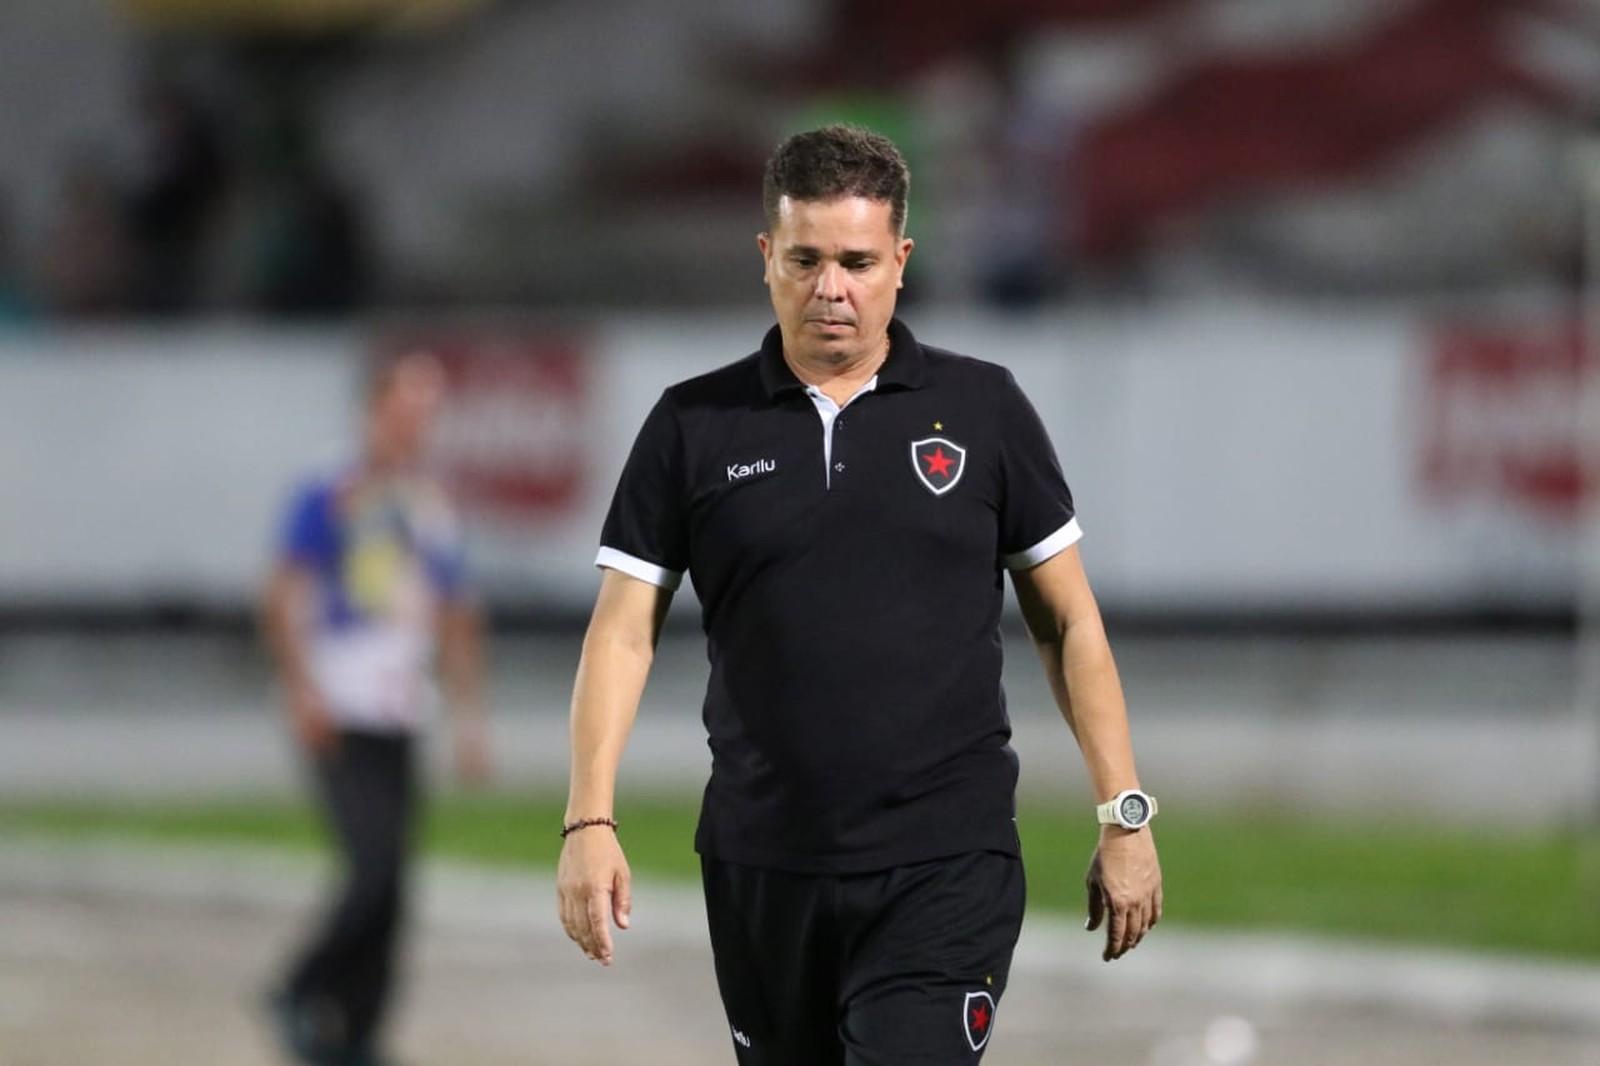 O legado de Evaristo Piza no Botafogo/PB